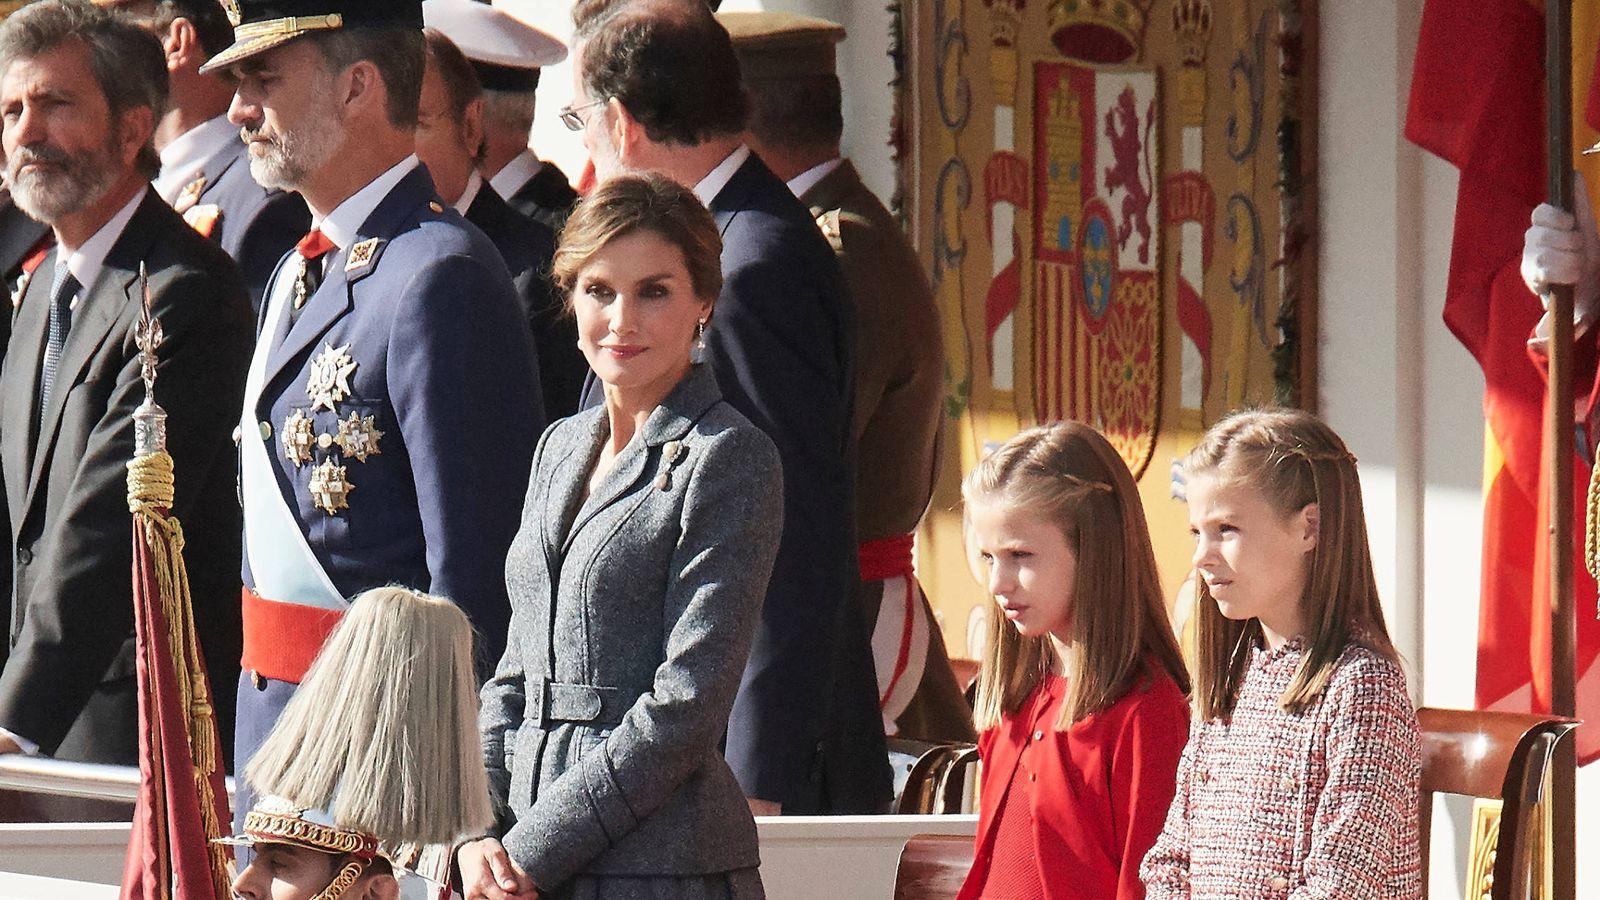 Foto: La Familia Real en el desfile militar del 12 de octubre de 2017. (Limited Pictures)